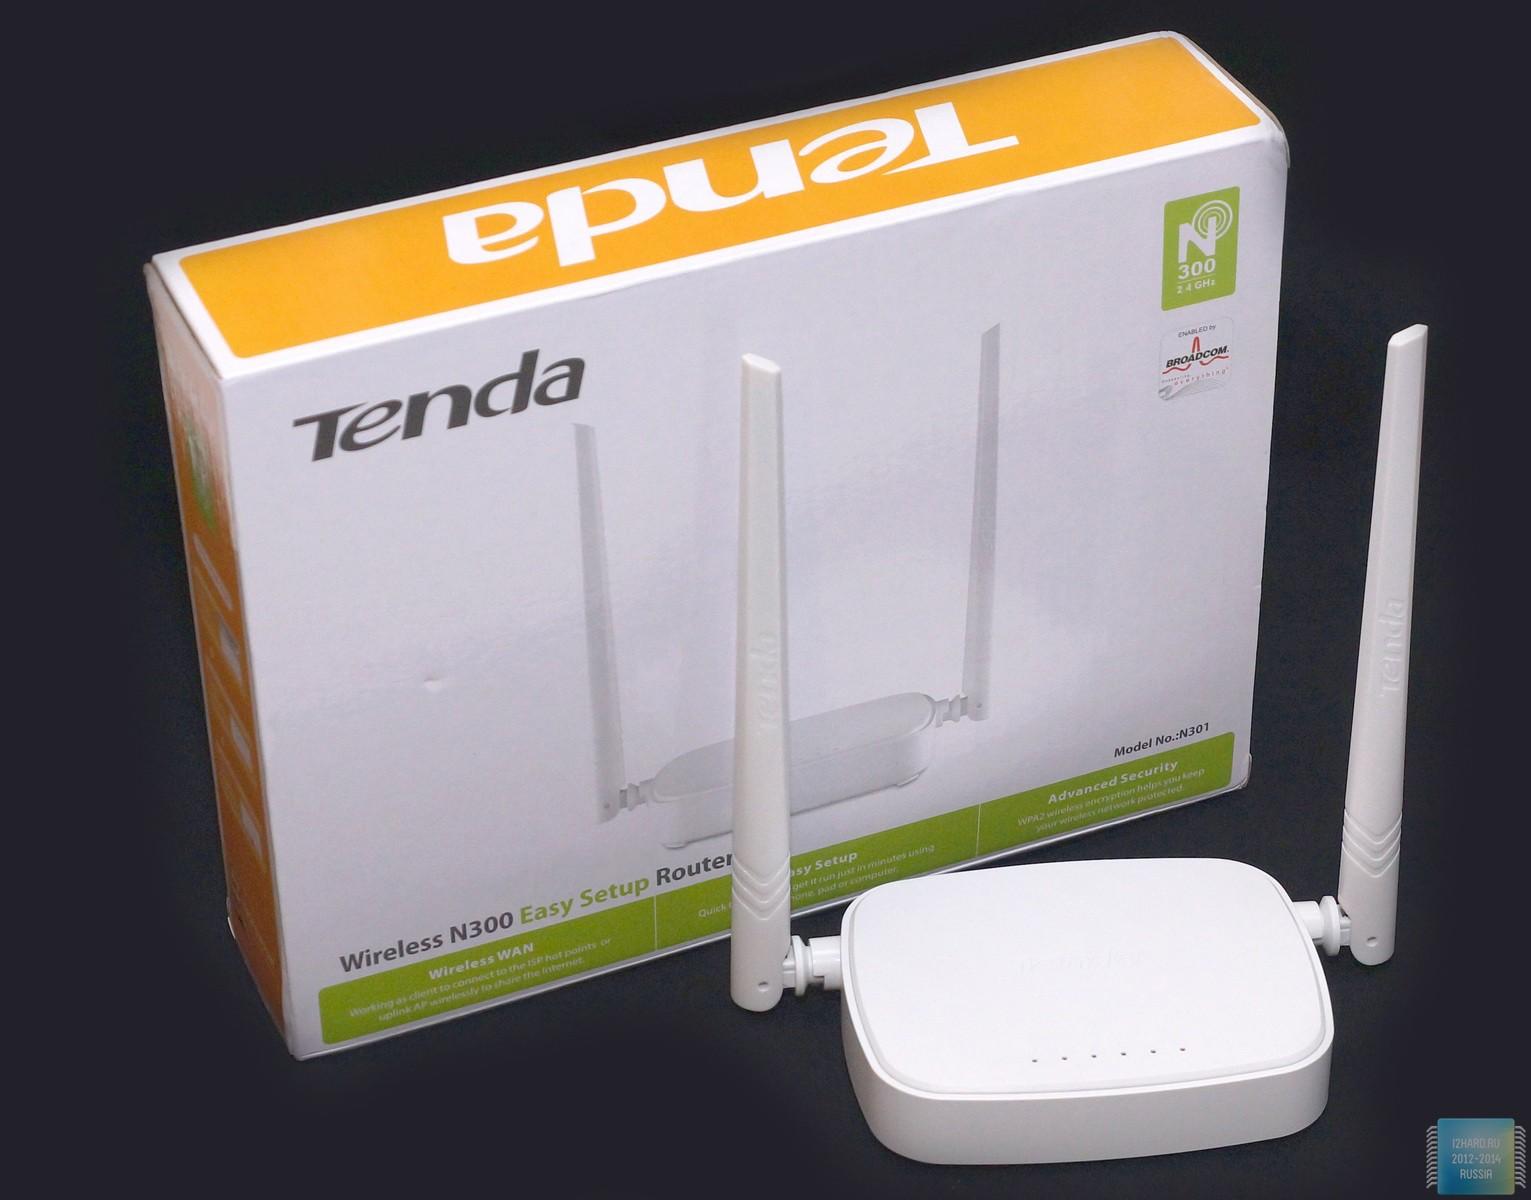 Tenda Wireless N301 I2hard Router 3 In 1 1000 300